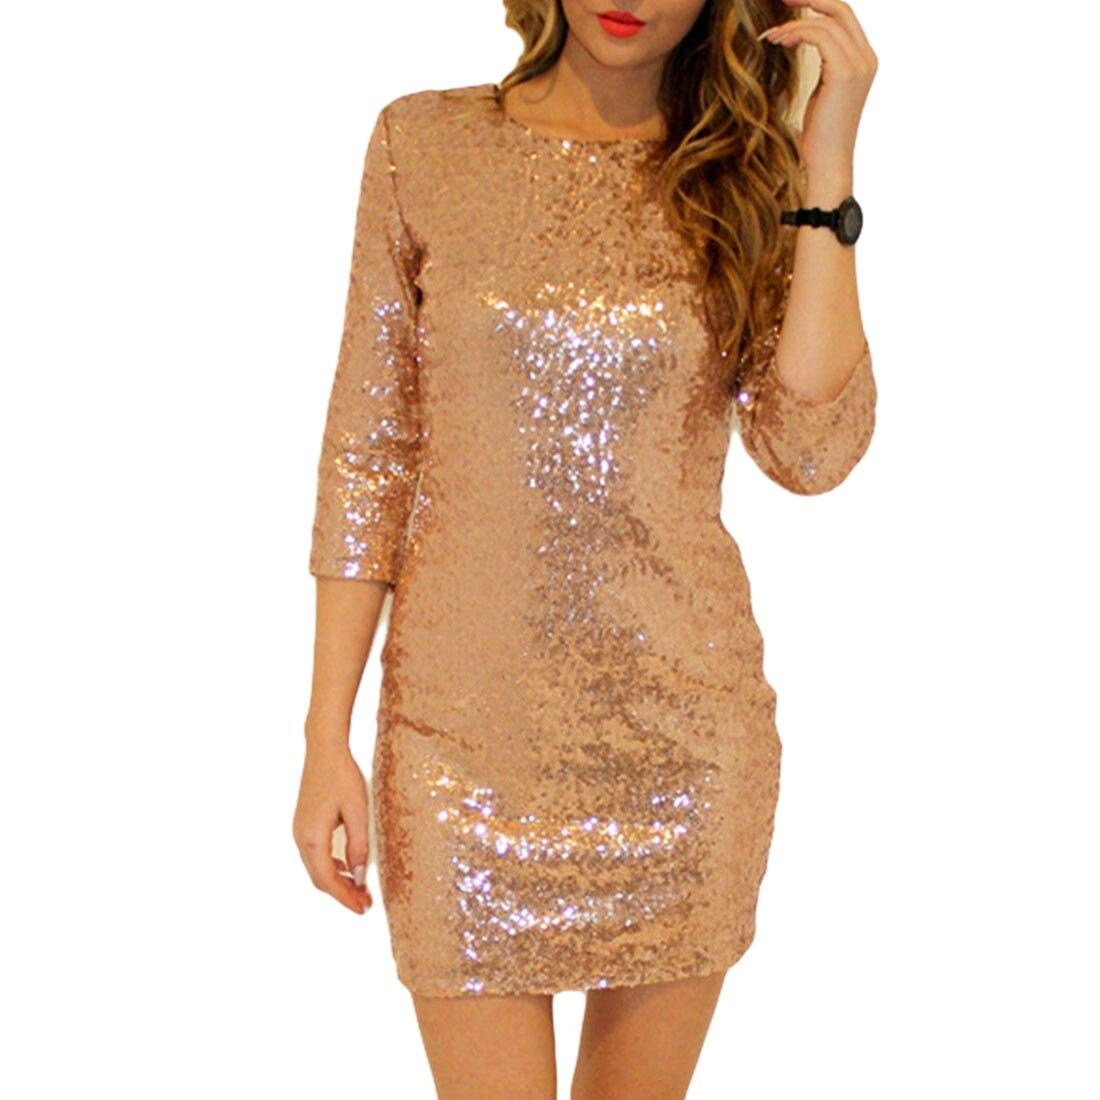 1Pcs Dresses Bag Hip Perspective bar club Halter Dress Fashion Sexy Bar Club Party Sequins Slim Ladies